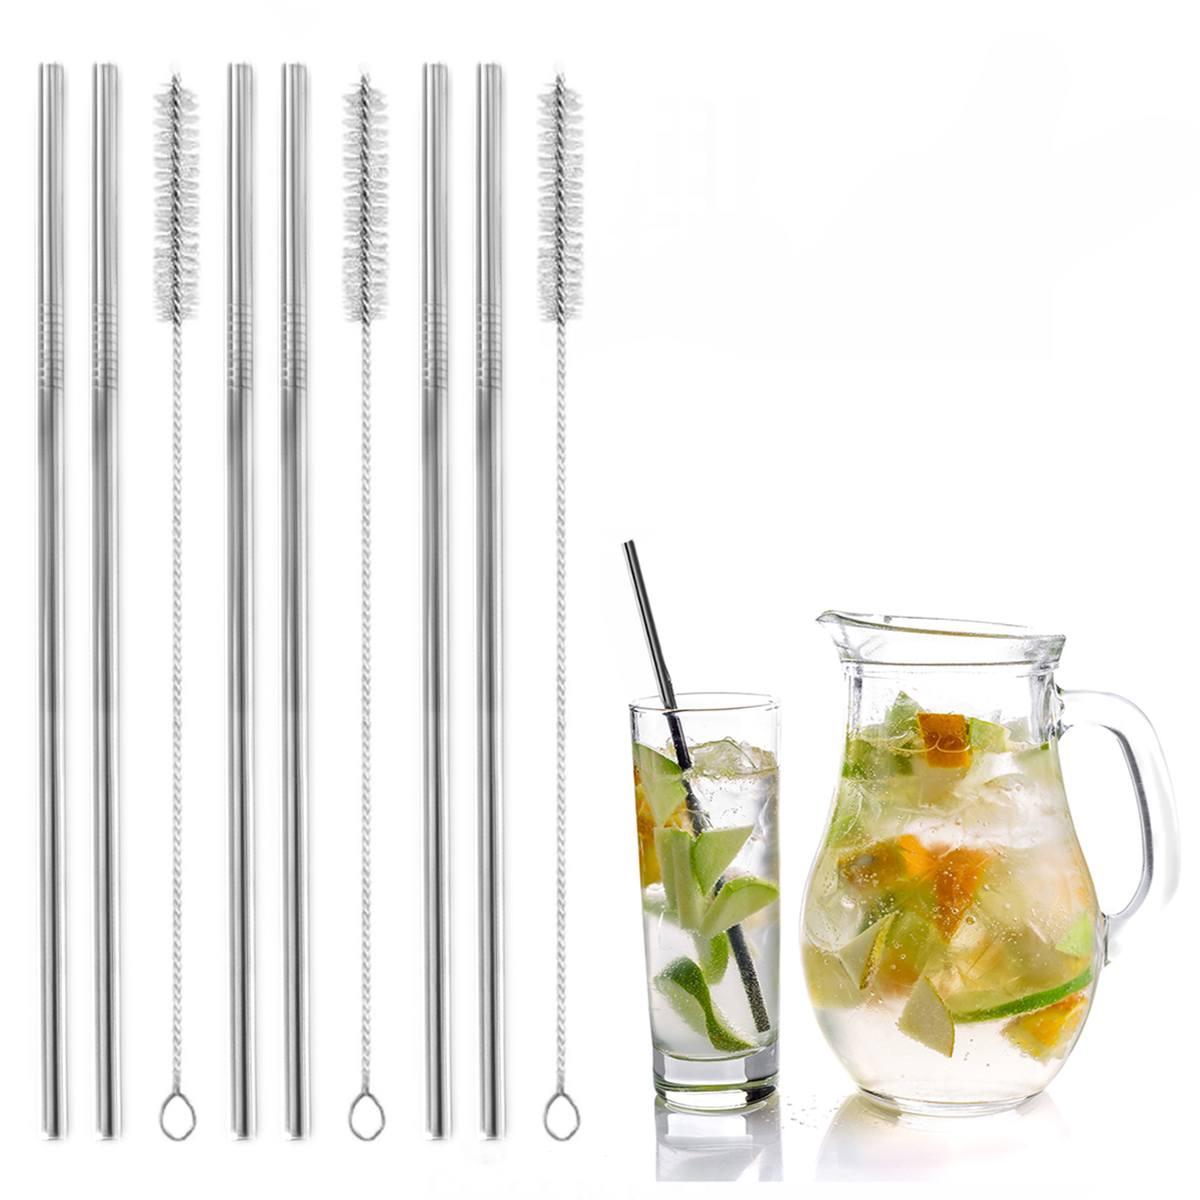 Kit 6 canudos reutilizáveis 21cm inox e 3 escovas Mimo Style